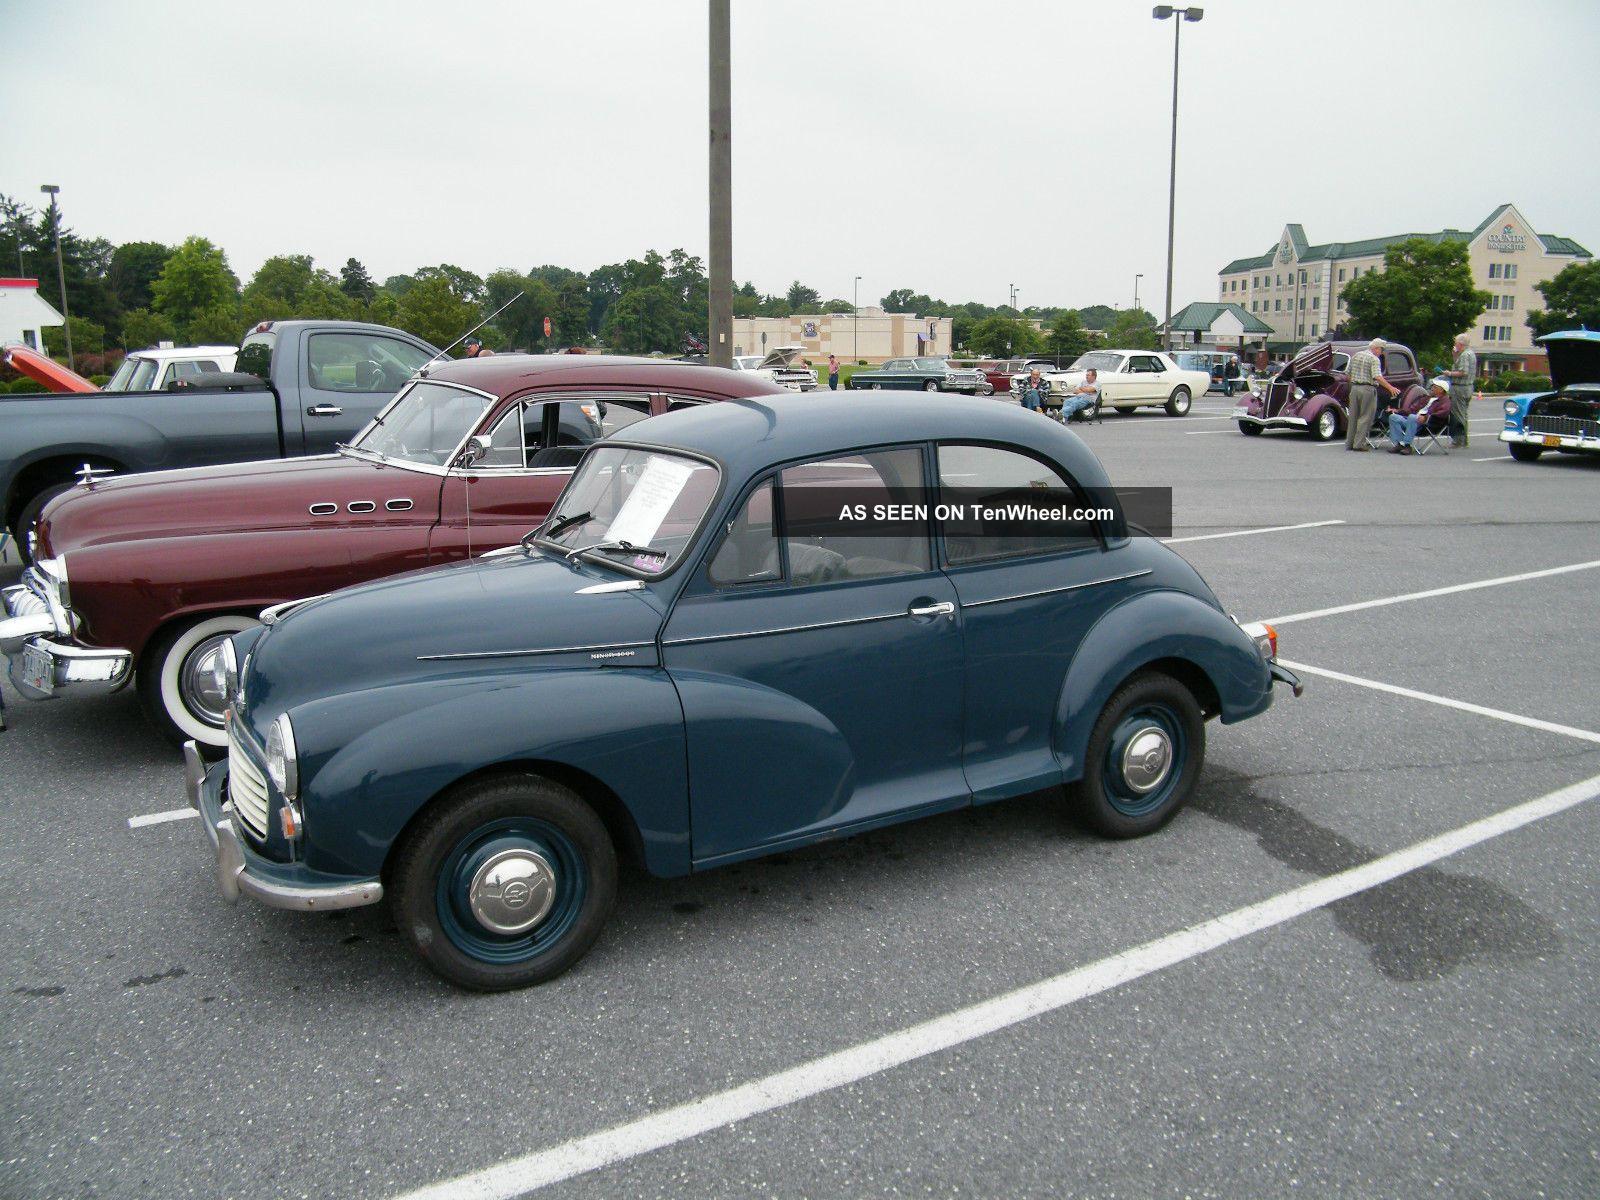 1966 Morris Minor 2dr Sedan Rh Drive,  1098 Eng, Other Makes photo